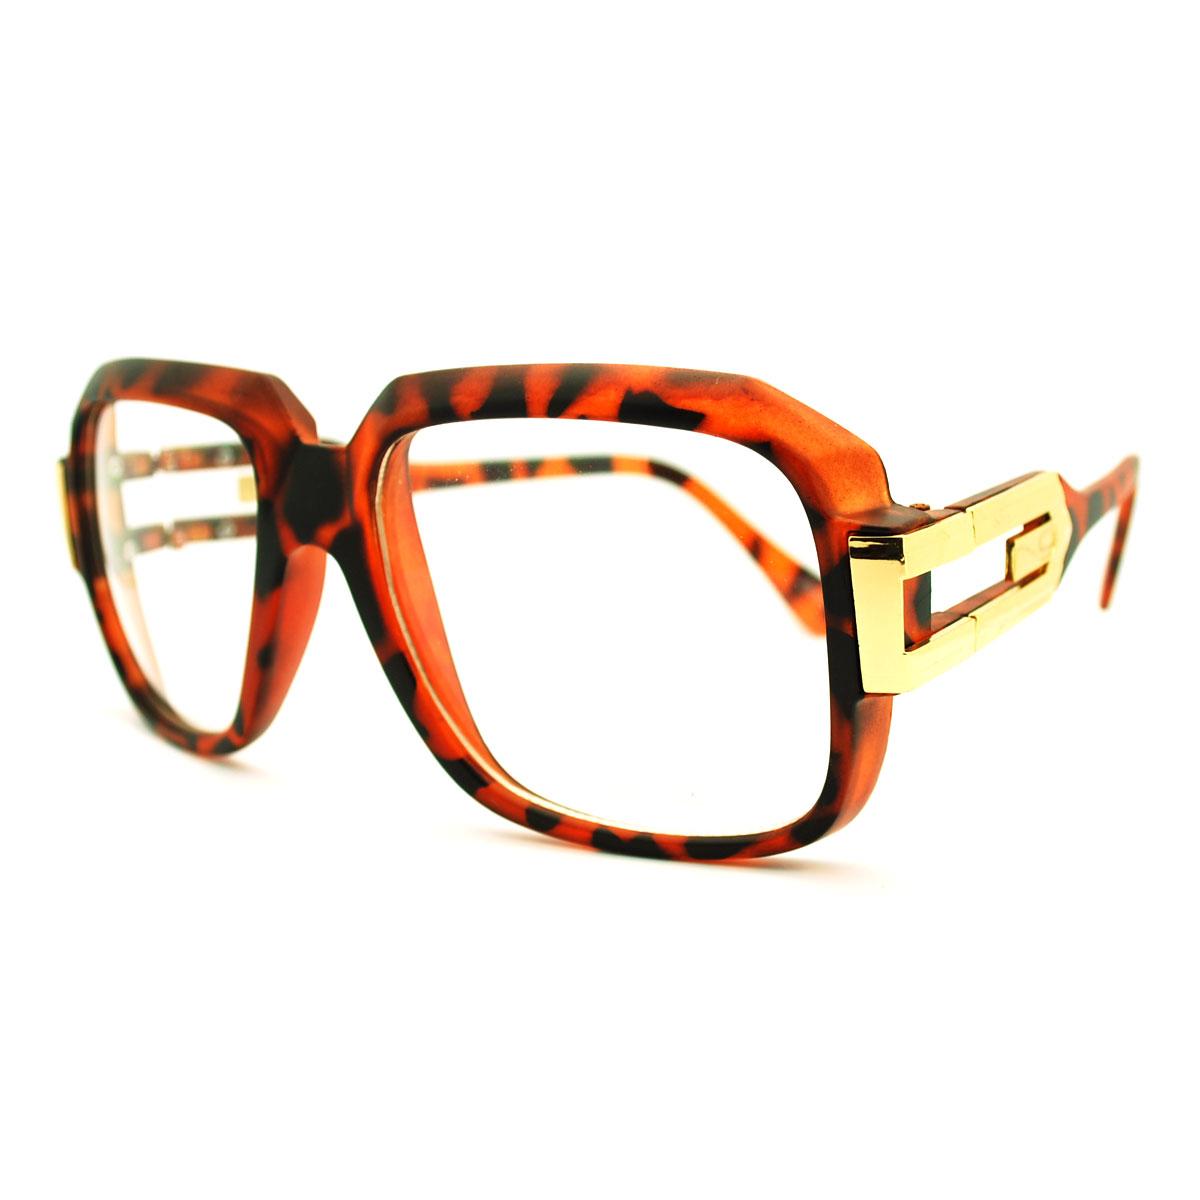 2b3d64d6bc0 Mens Hip Hop Rapper Gazelle Rectangular nerdy 80s Geek Clear Lens Glasses